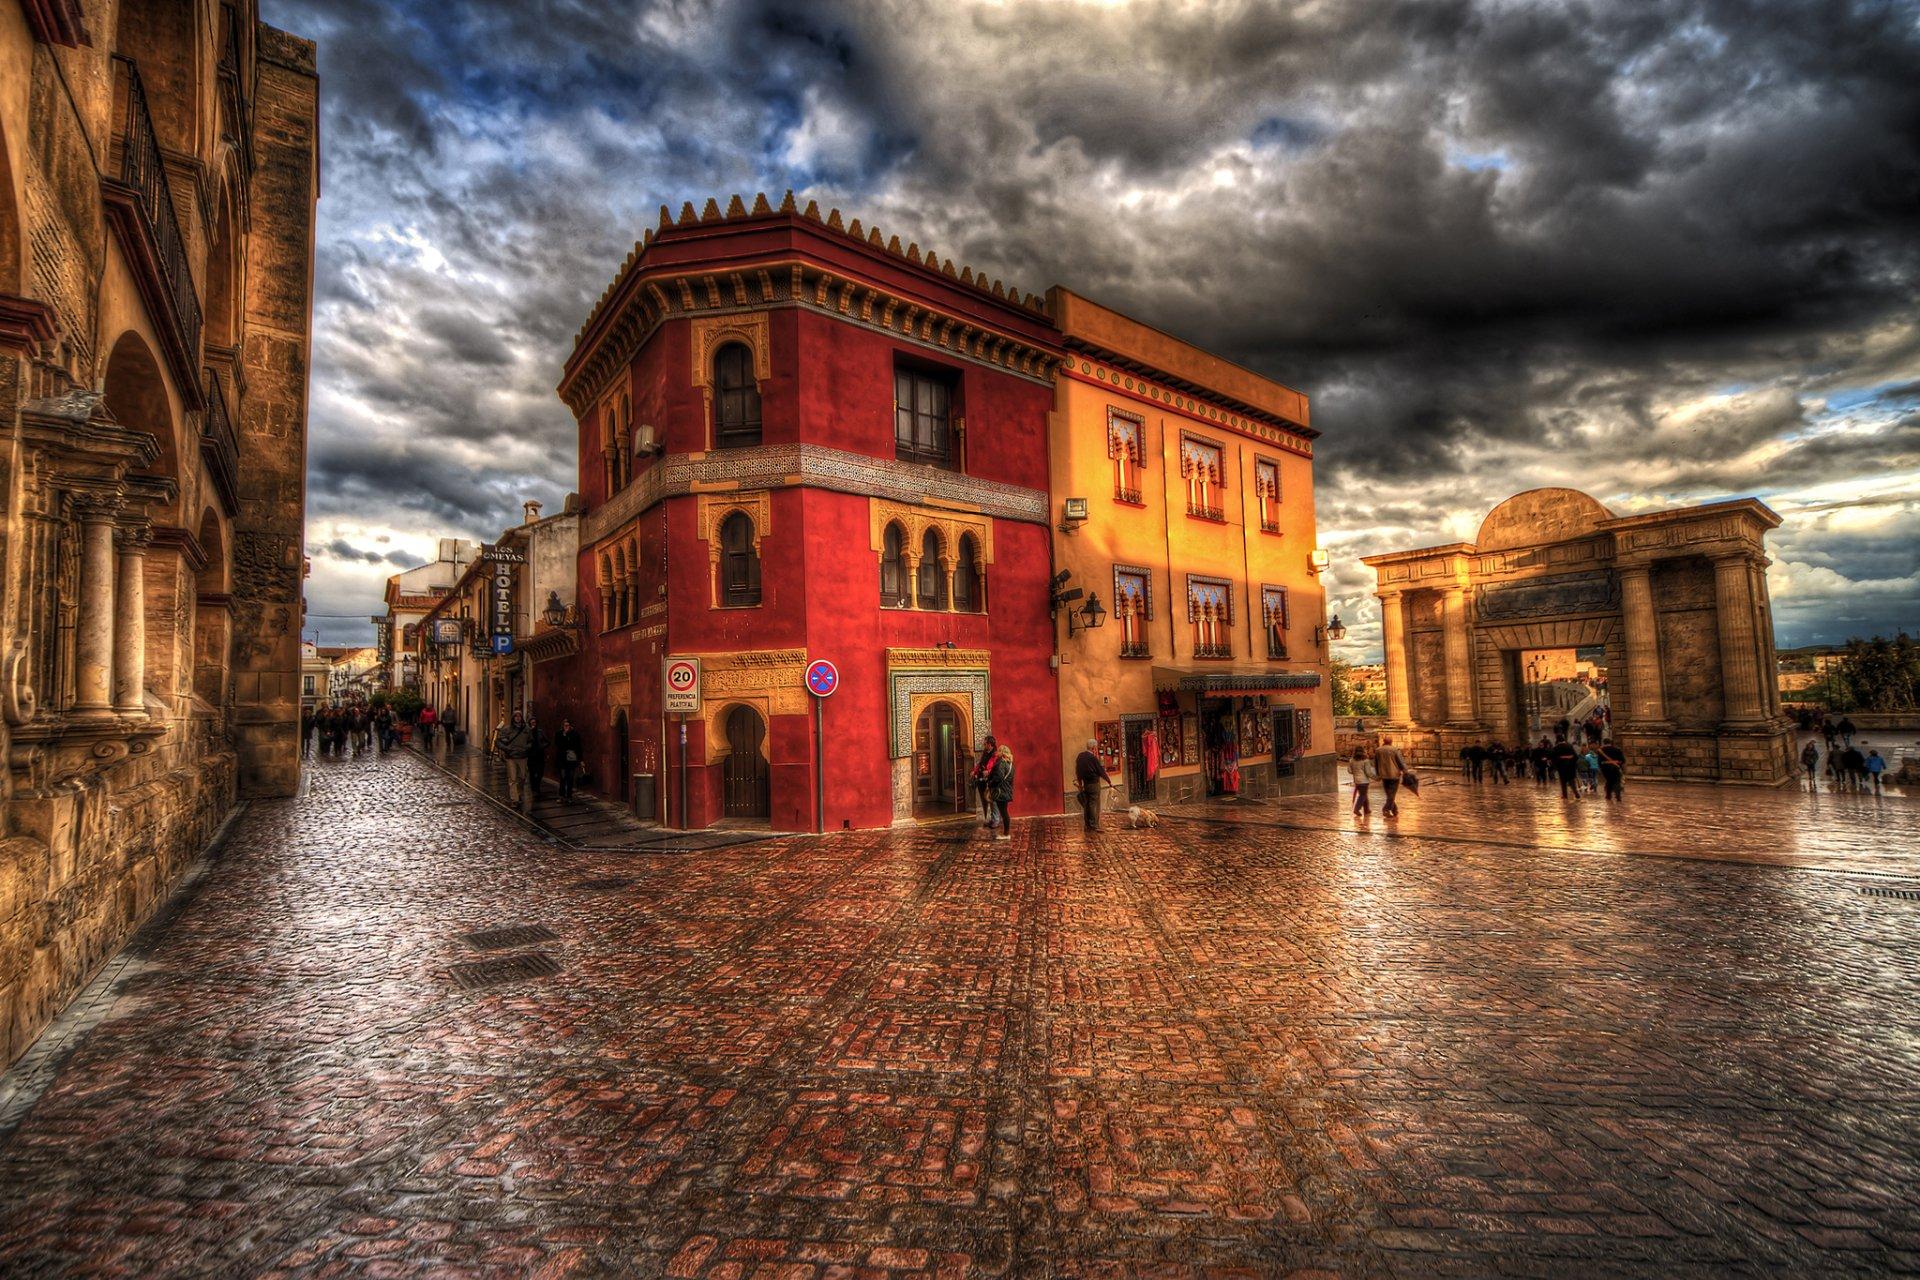 Fondo Espana Hd: Town Square In Cordoba, Spain HD Wallpaper